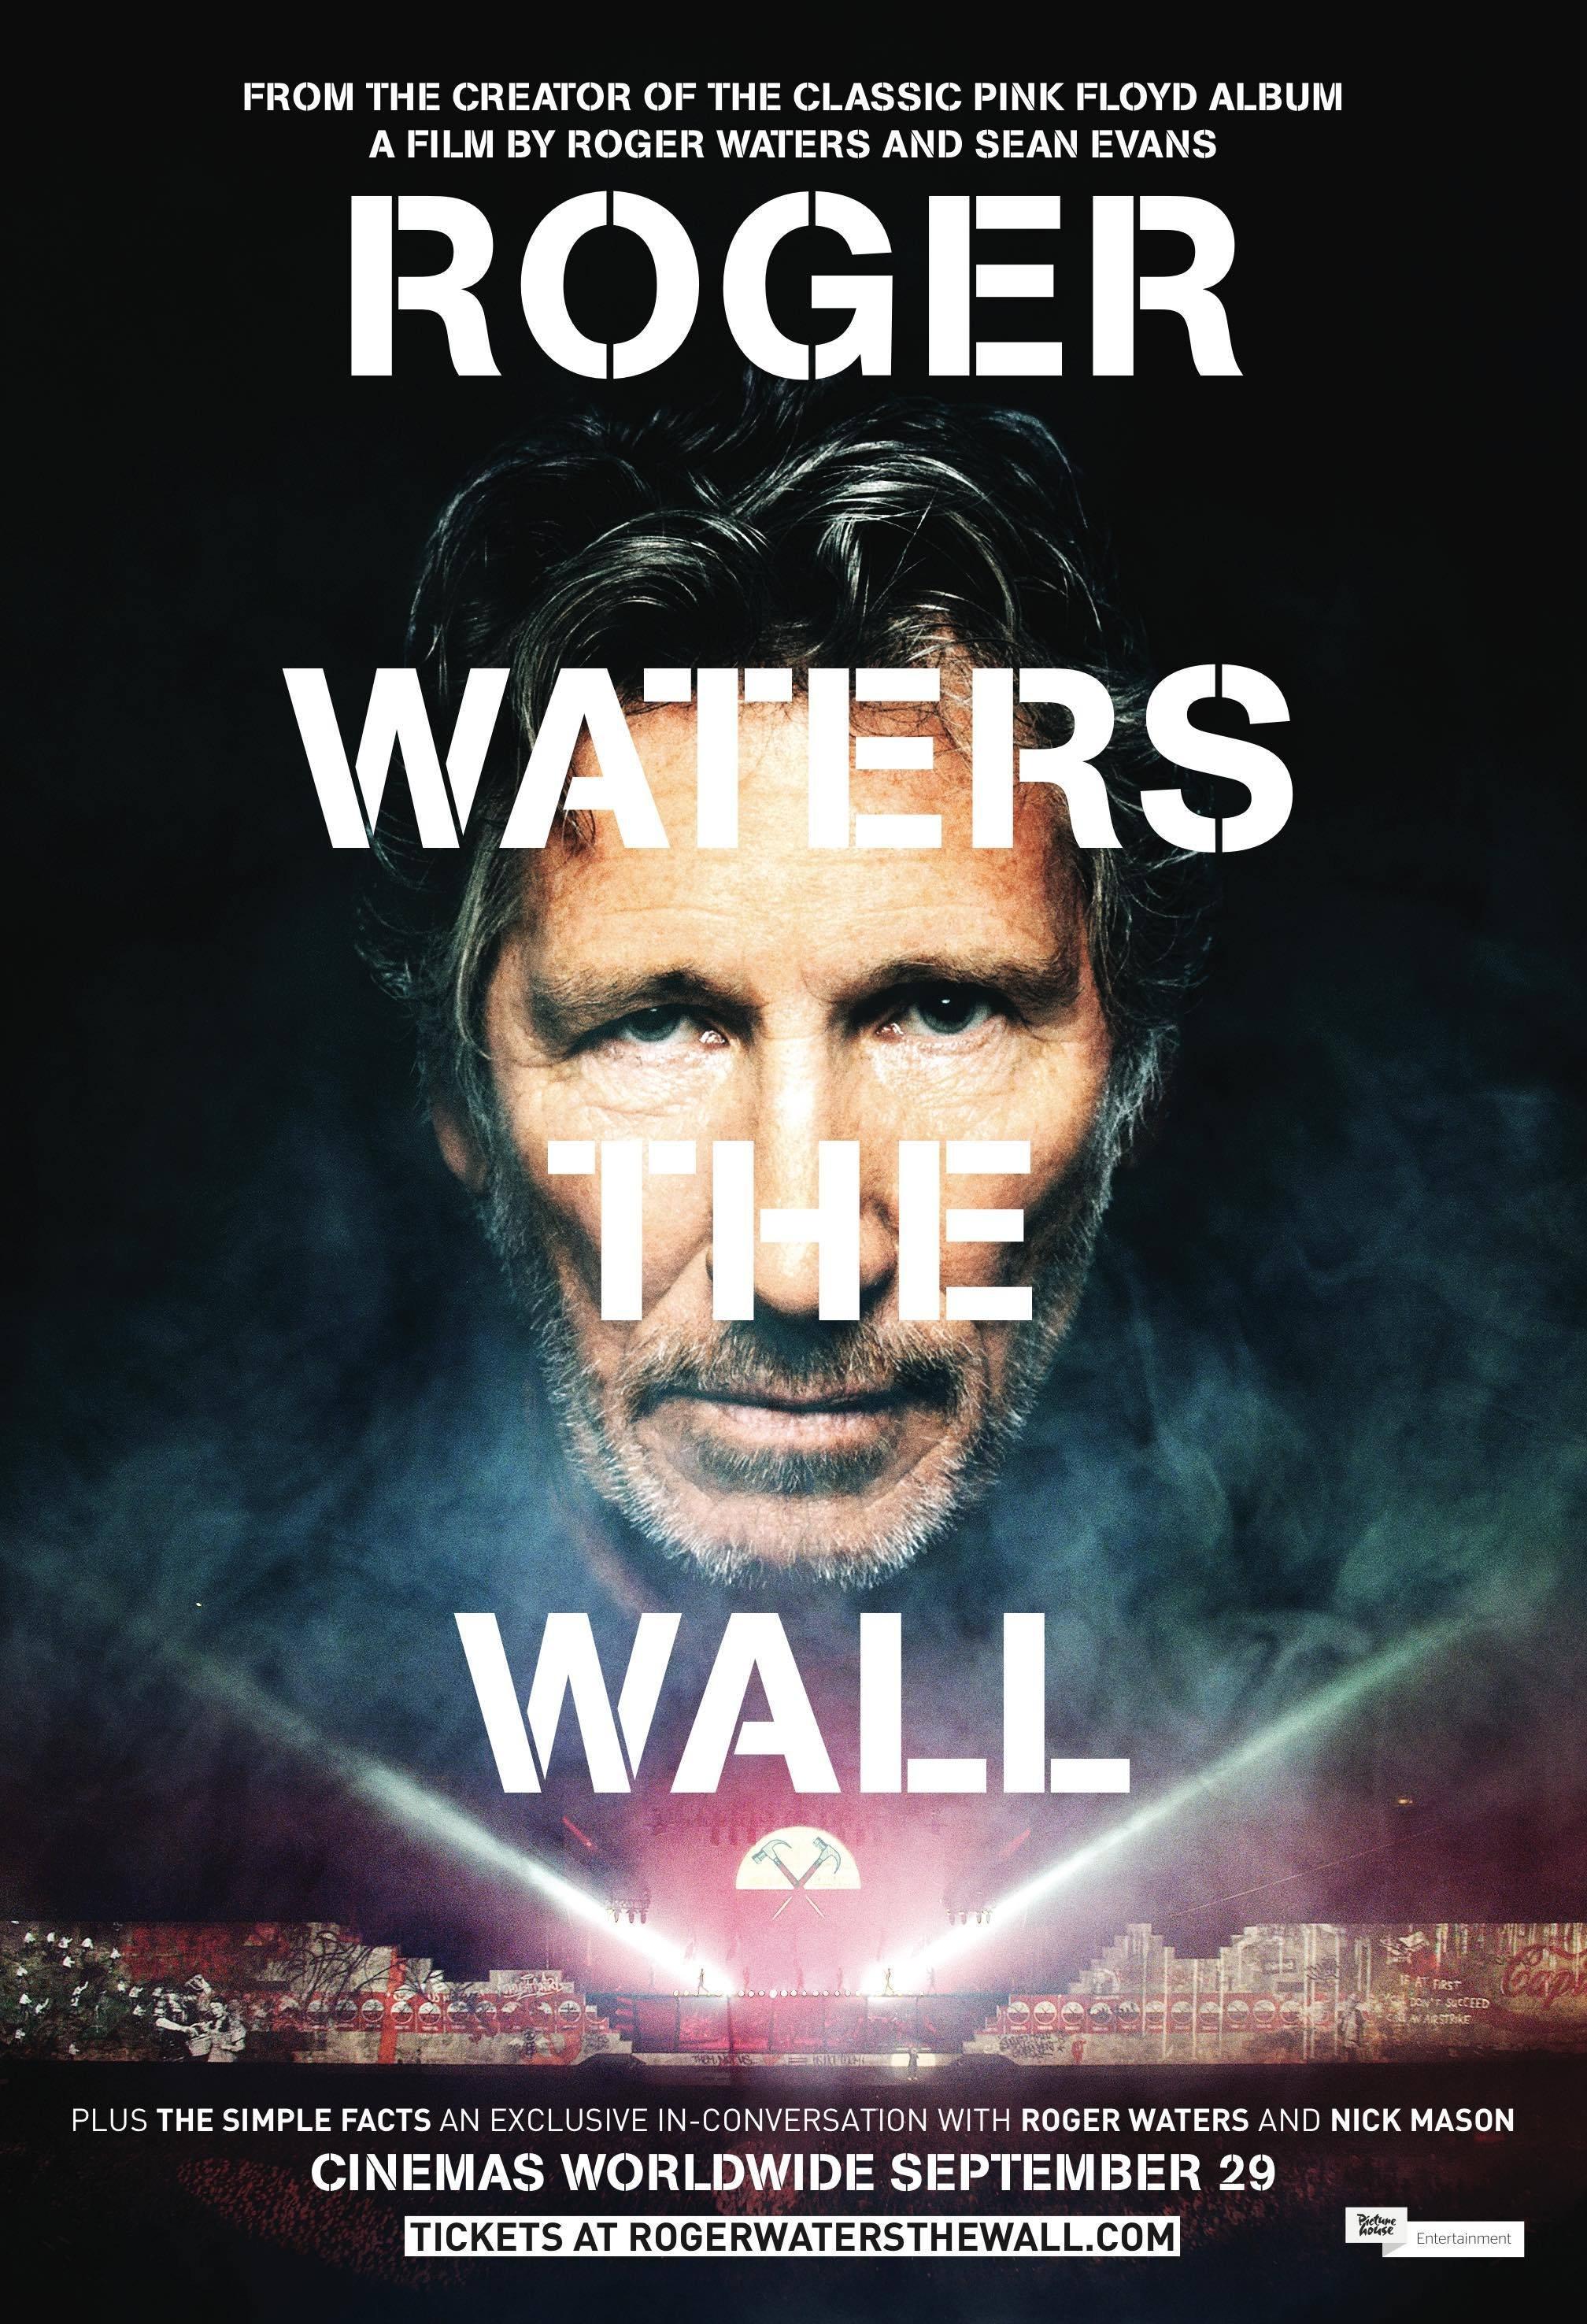 Roger Waters The Wall Türkçe Dublaj izle